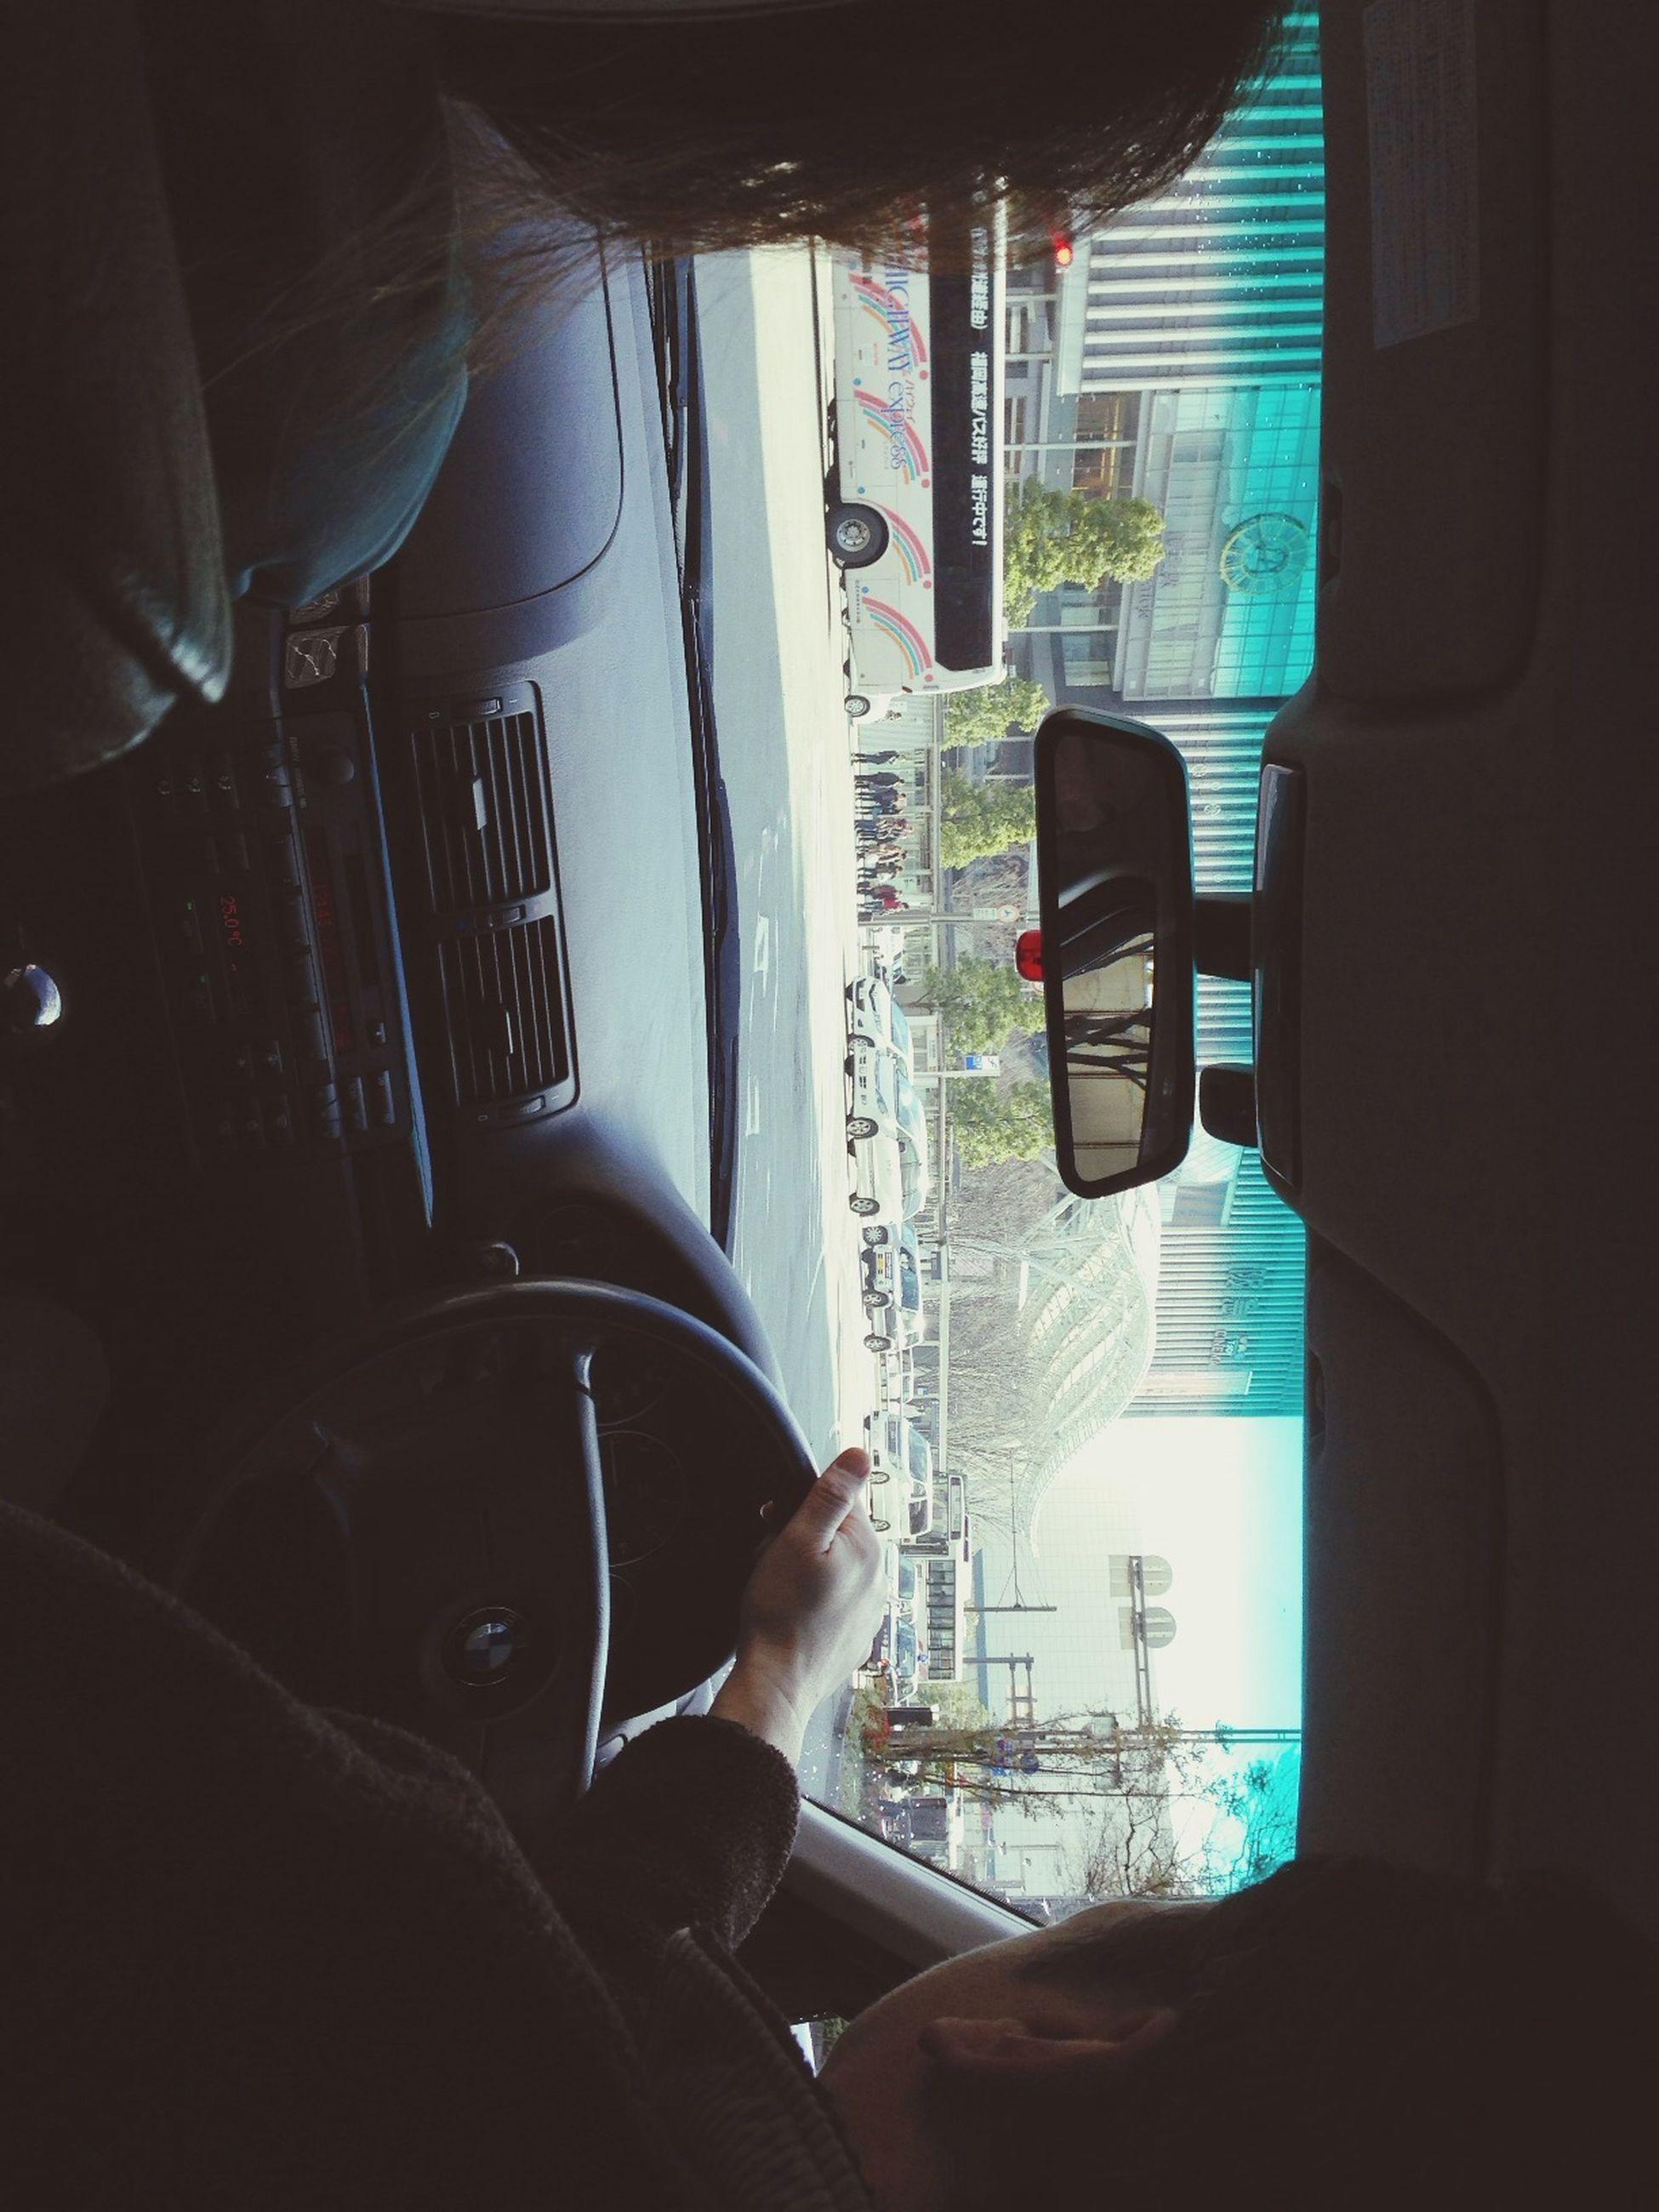 transportation, vehicle interior, mode of transport, land vehicle, car, car interior, glass - material, window, travel, transparent, windshield, lifestyles, men, leisure activity, looking through window, public transportation, driving, journey